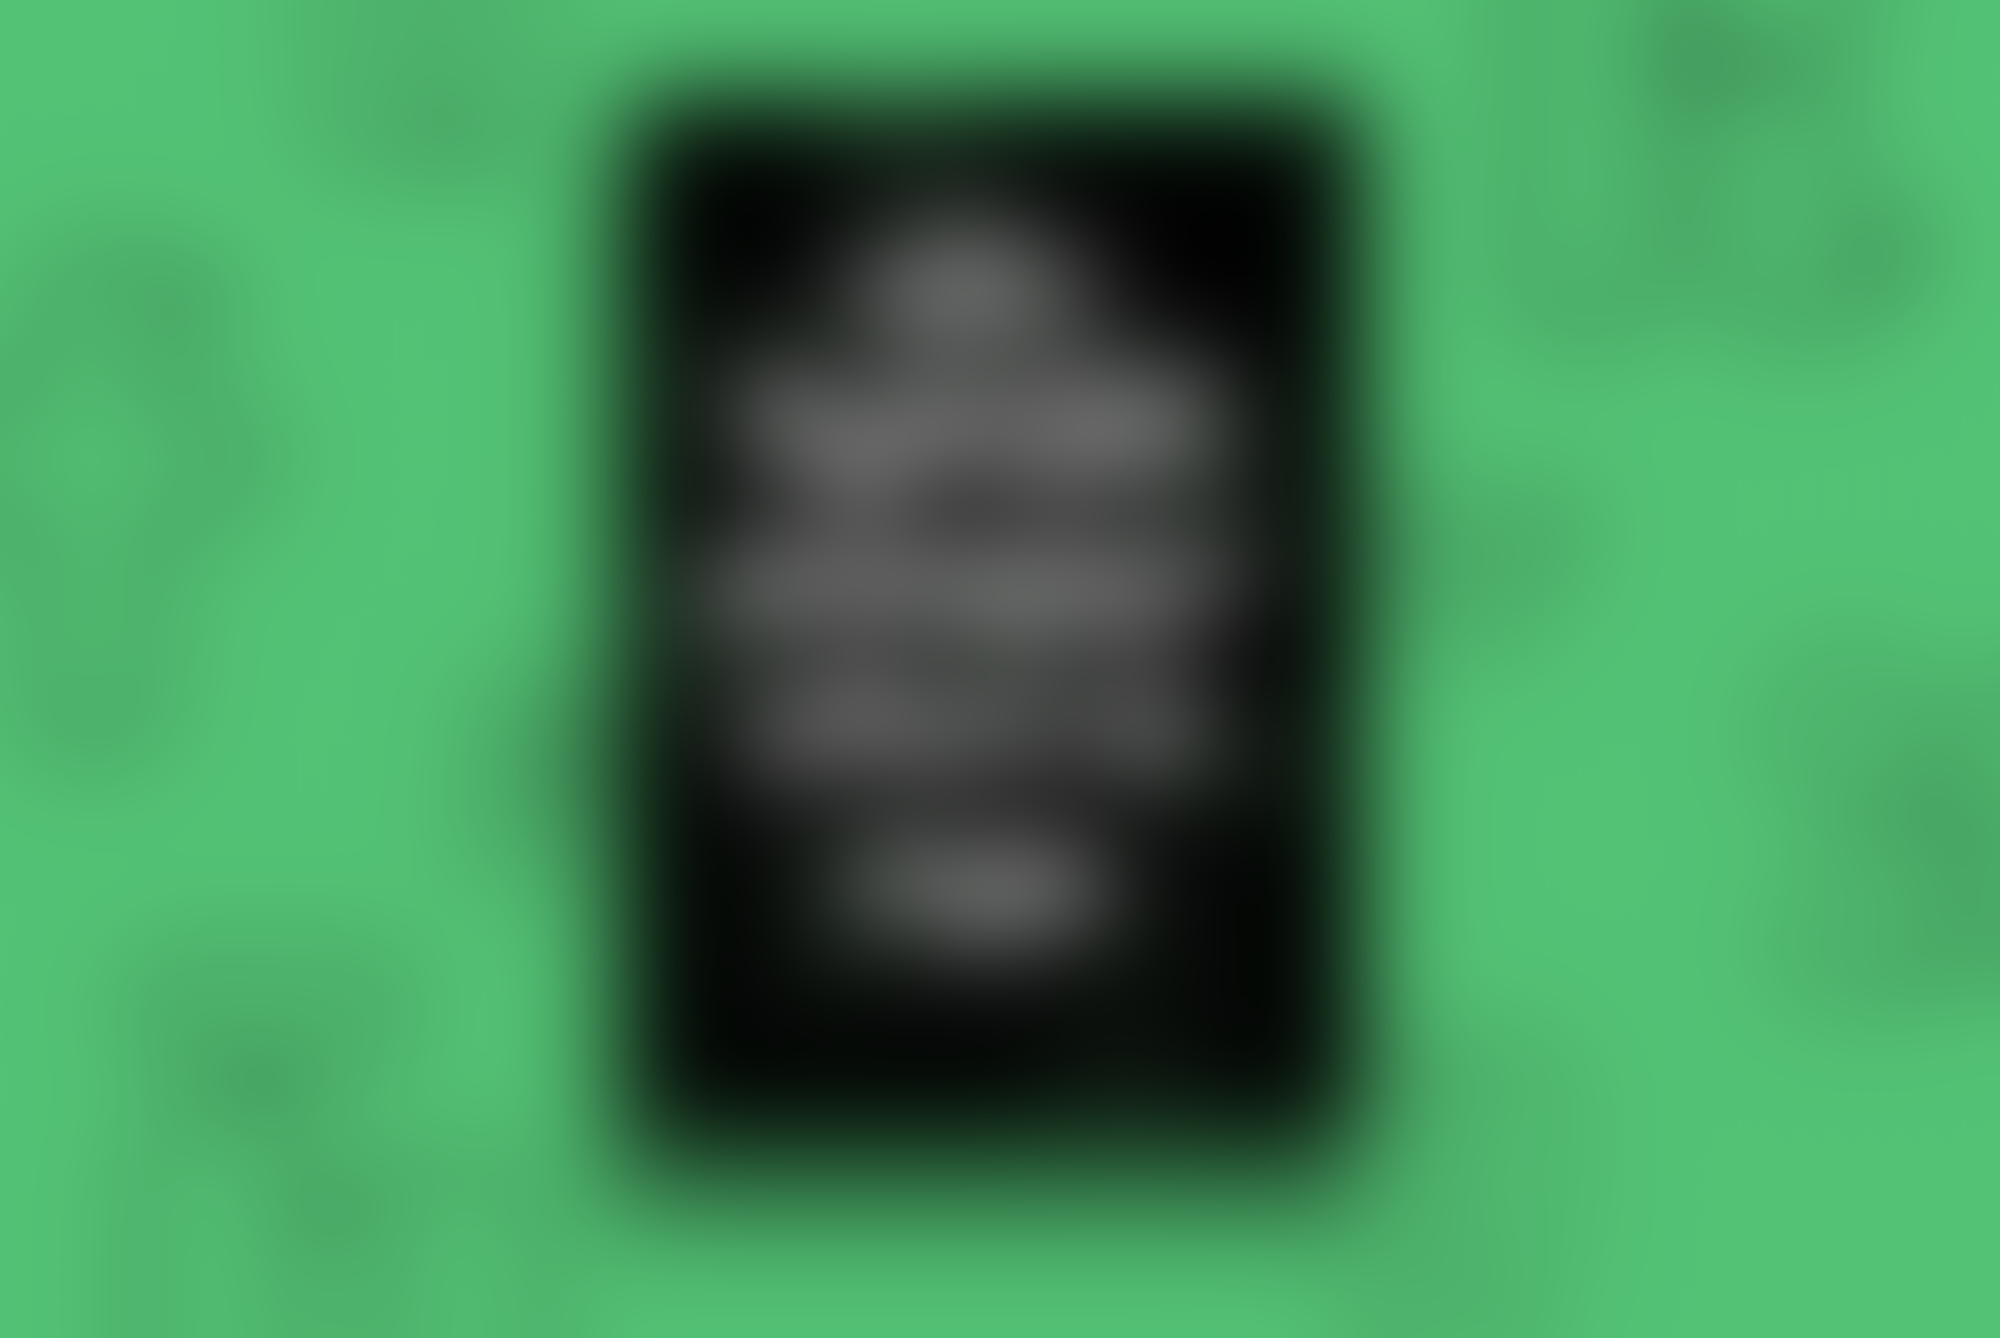 6 181003 101913 autocompressfitresizeixlibphp 1 1 0max h2000max w3 D2000q80s1d03313de67f2366dada81cafcd0671c